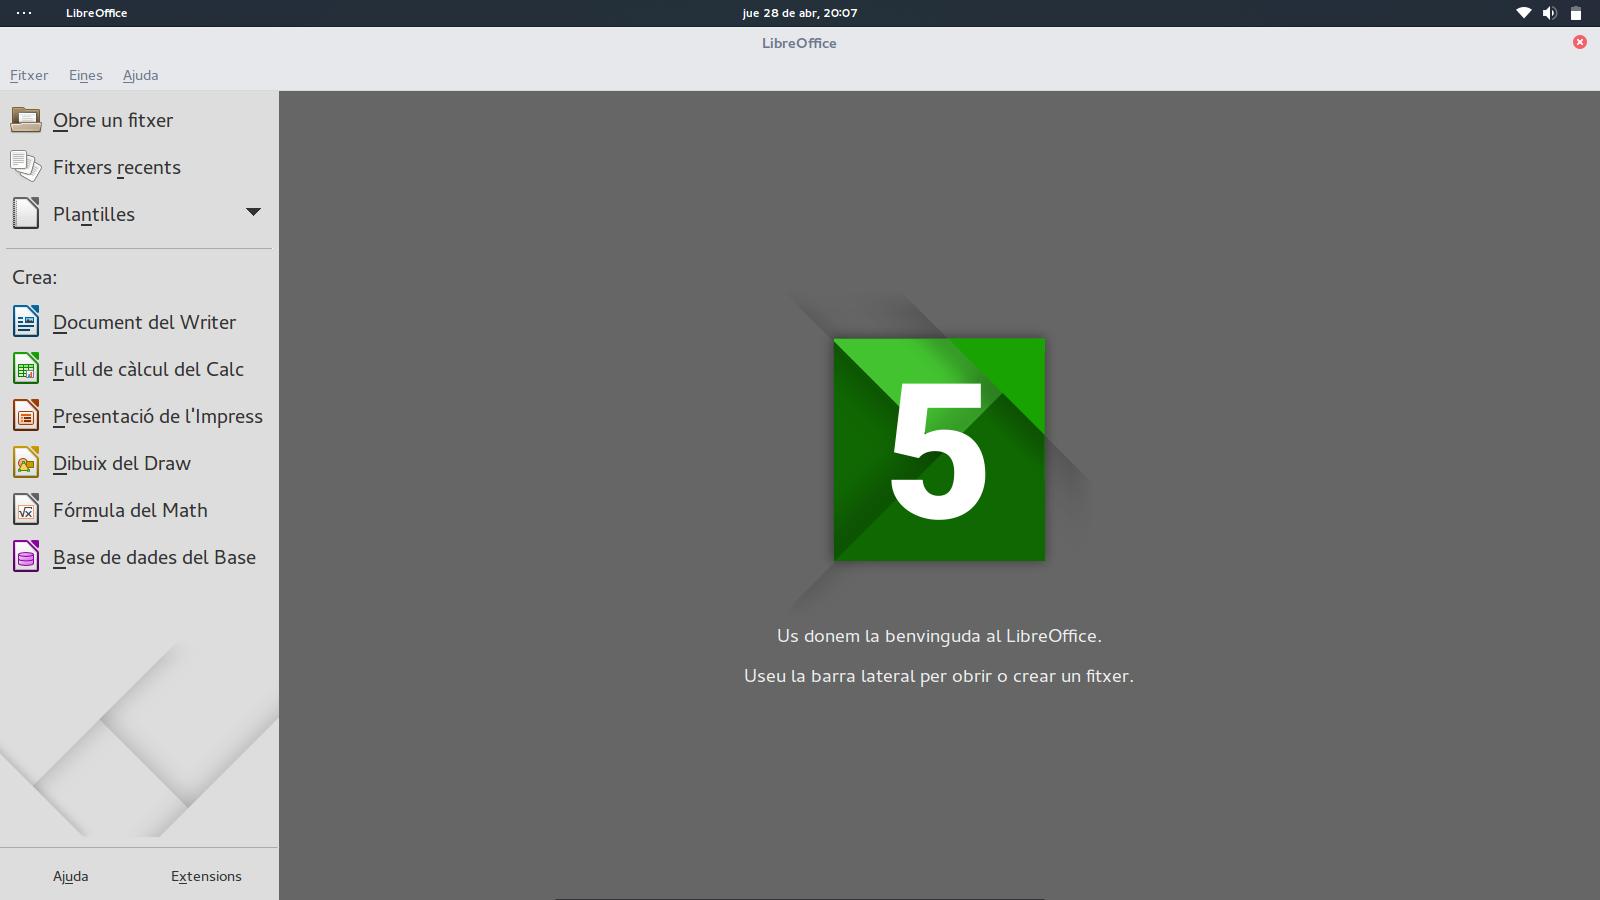 Imatge destacada 1 del LibreOffice